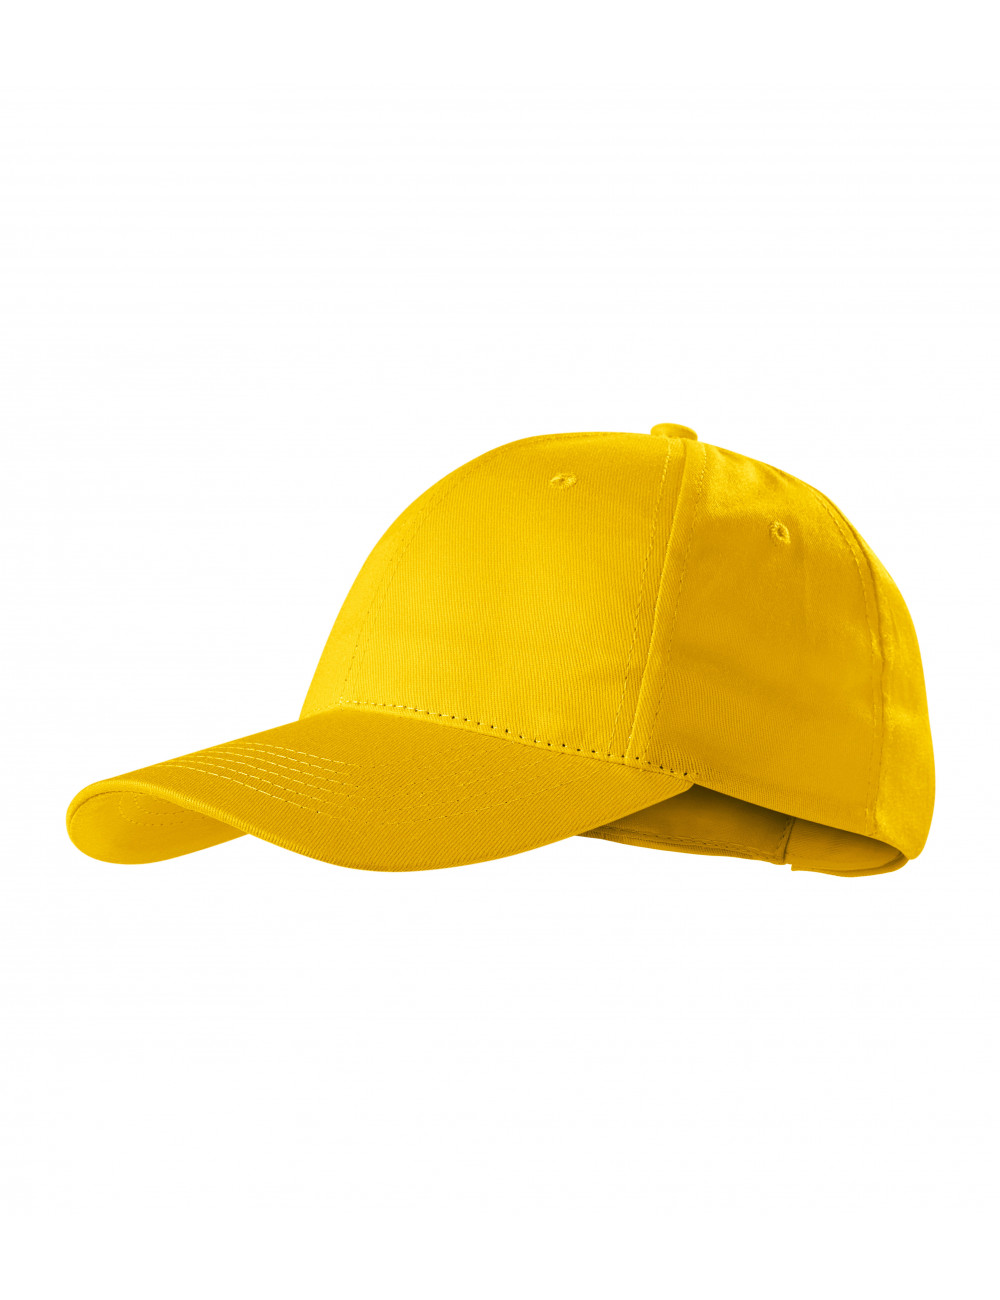 Adler PICCOLIO Czapka unisex Sunshine P31 żółty